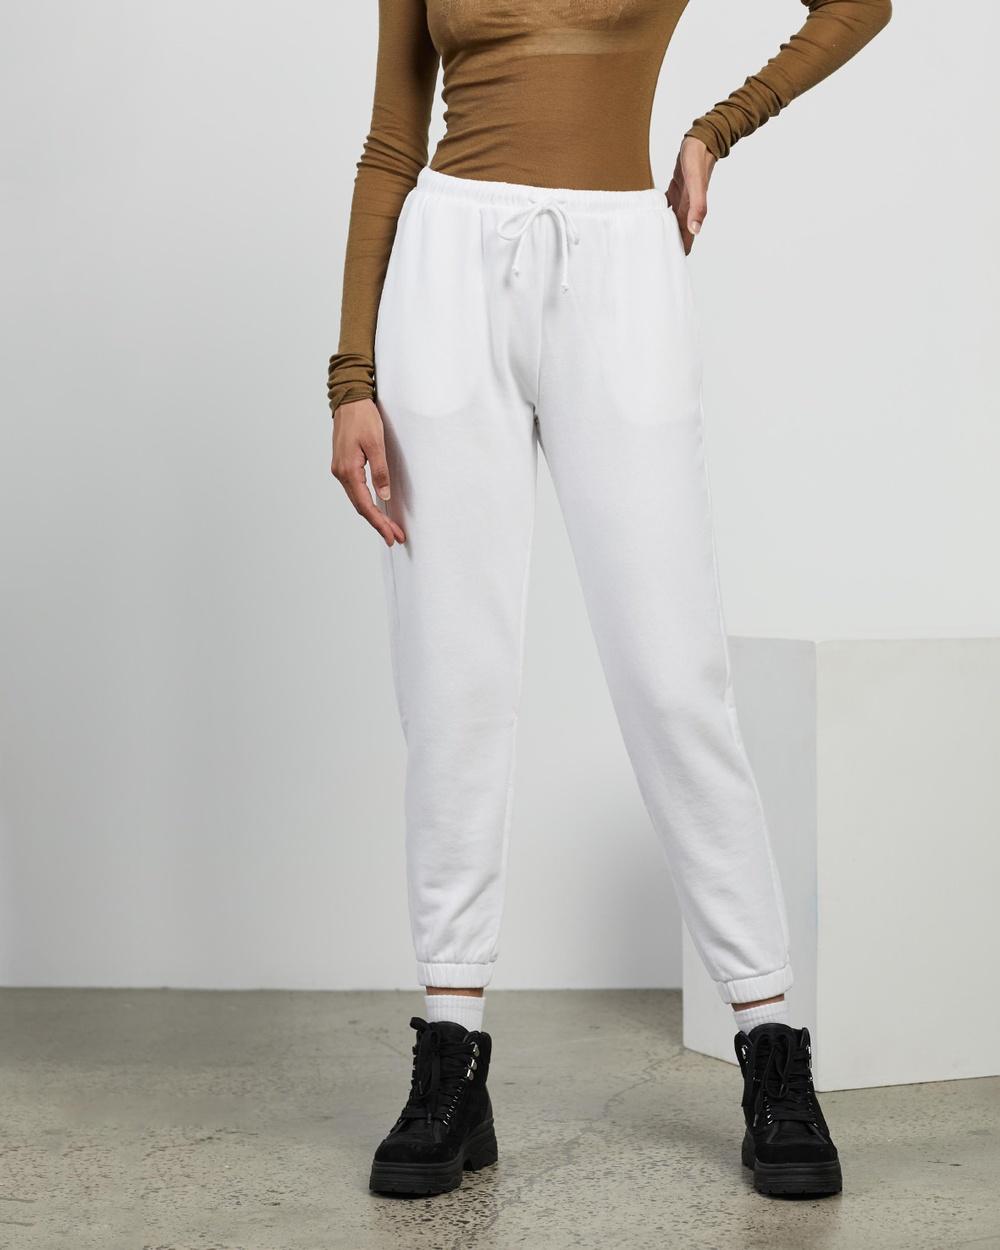 American Vintage Fobye Joggers Sweatpants White